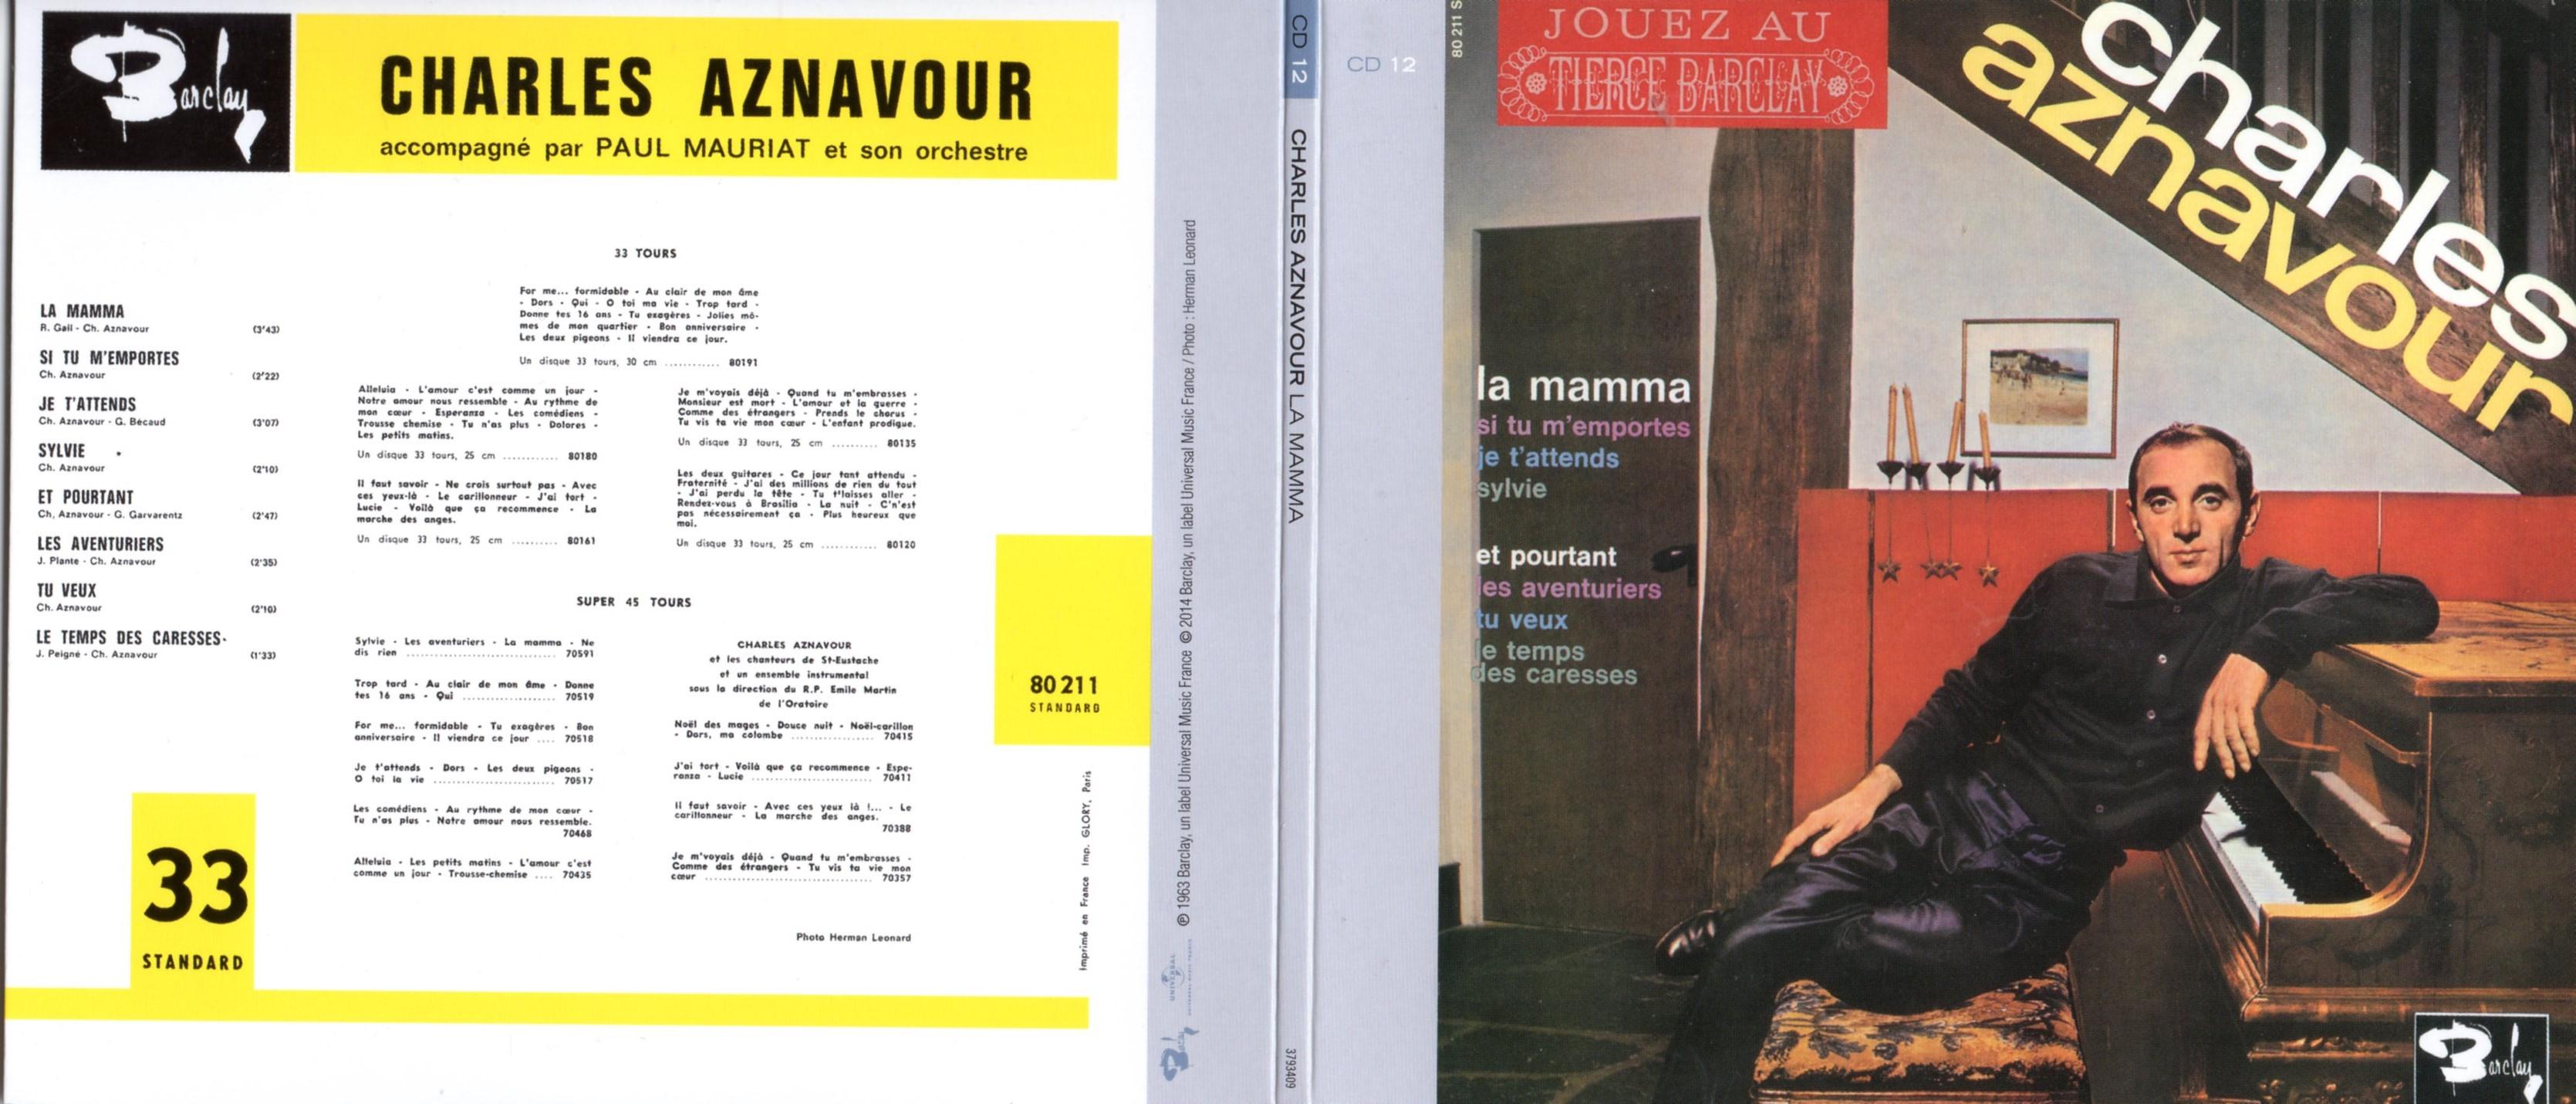 CHARLES AZNAVOUR - La Mamma (1963) Gatefold Card board sleeve Replica - CD